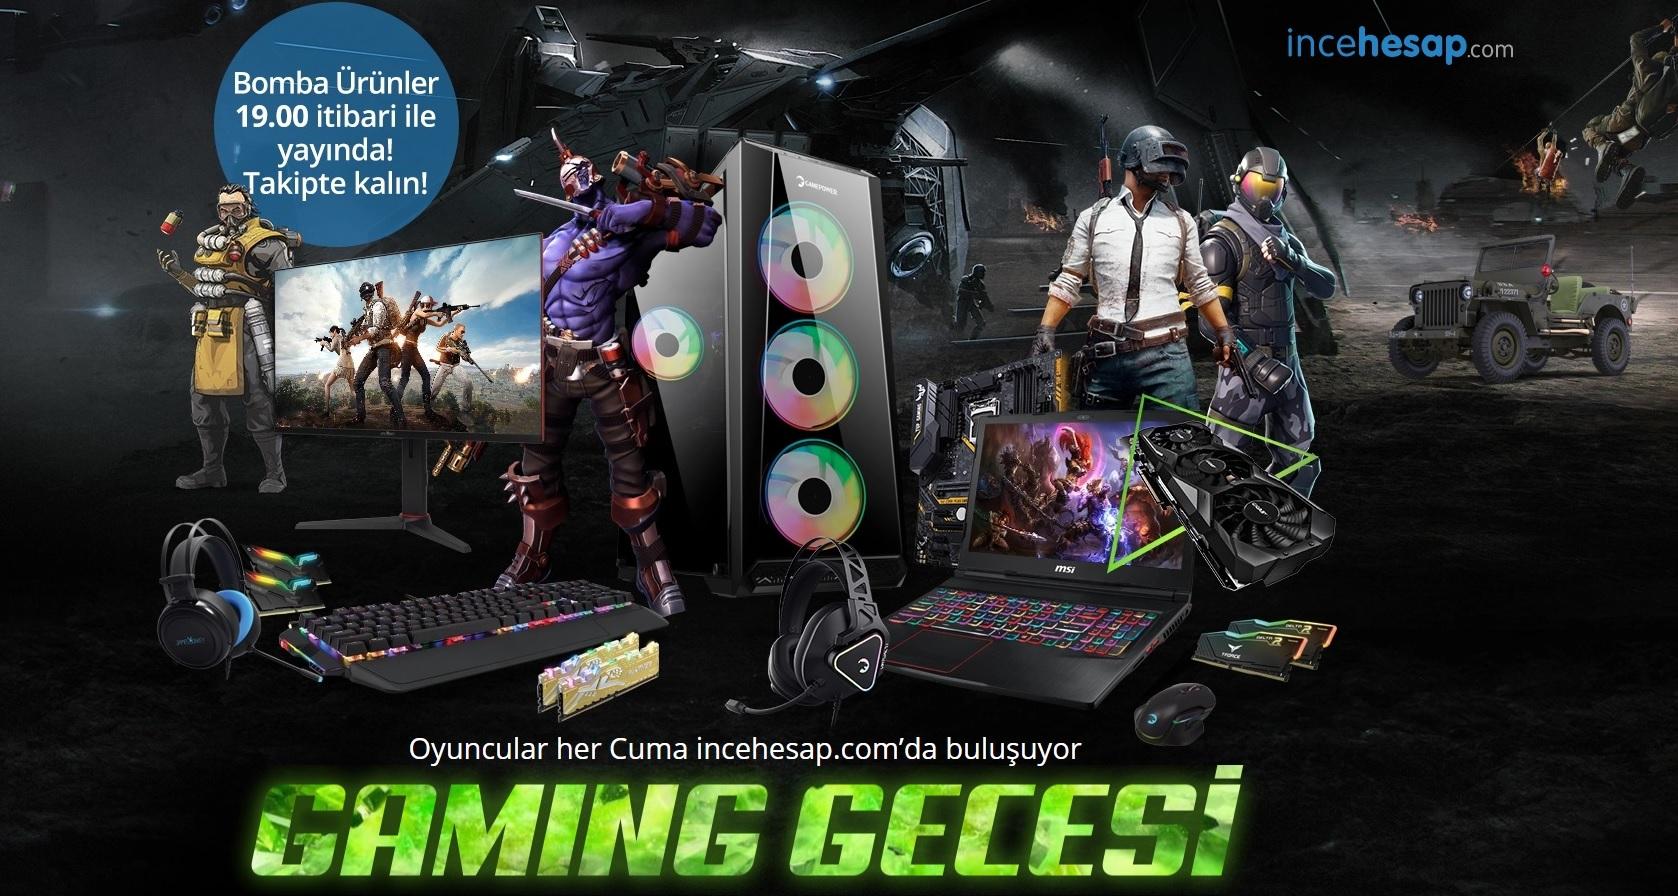 incehesap-com-gaming-gecesi-kampanya-fiyatlari-en-son.jpg